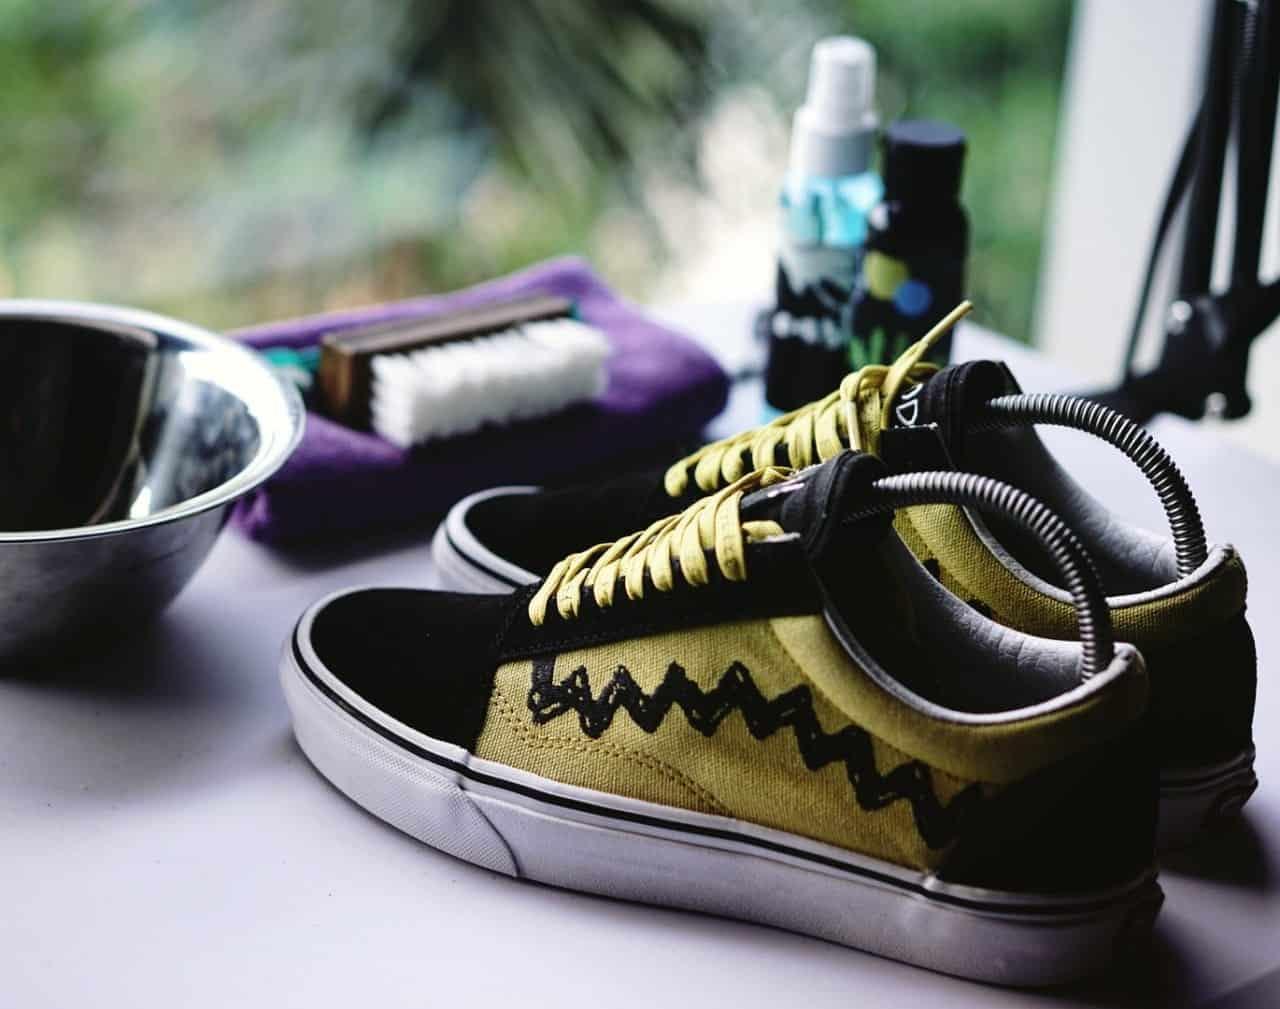 Peluang Usaha Cuci Sepatu Yang Menjanjikan Analisa Lengkap